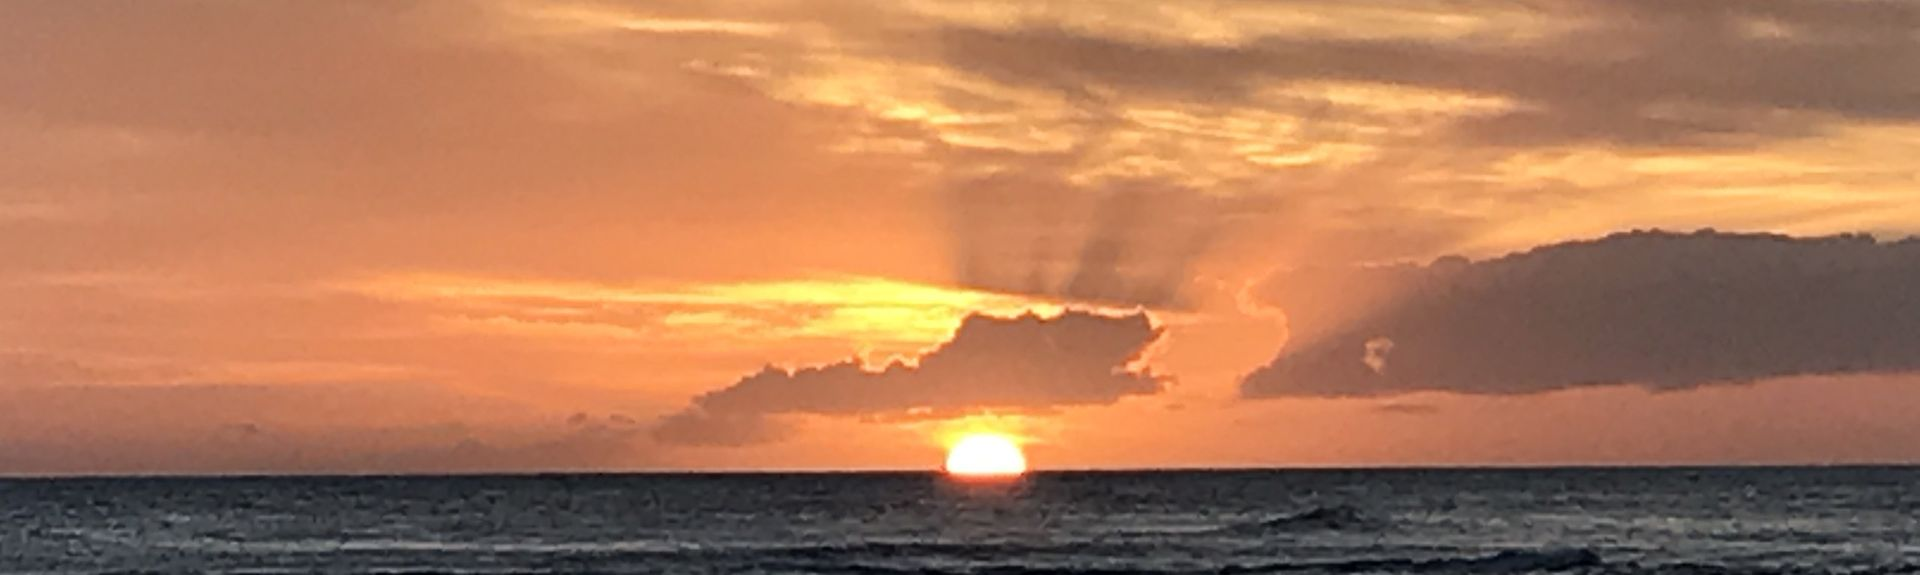 Manauloha at Poipu Kai, Koloa, Hawaii, United States of America